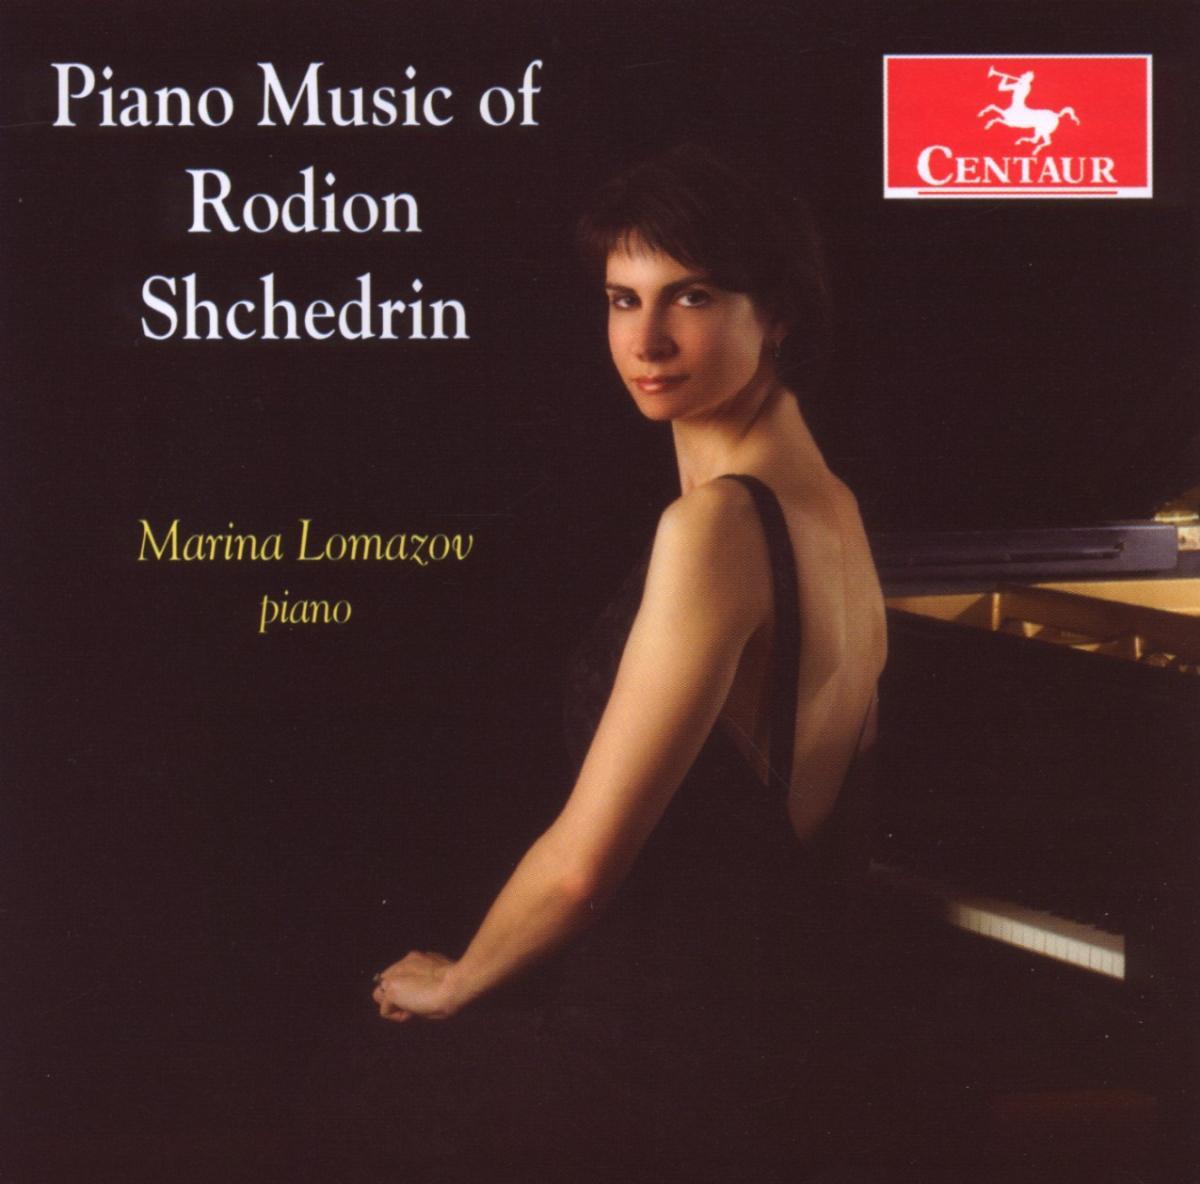 Piano Music - Shchedrin,rodion / Lomazov,mariana - Musik - Centaur - 0044747299129 - July 28, 2009